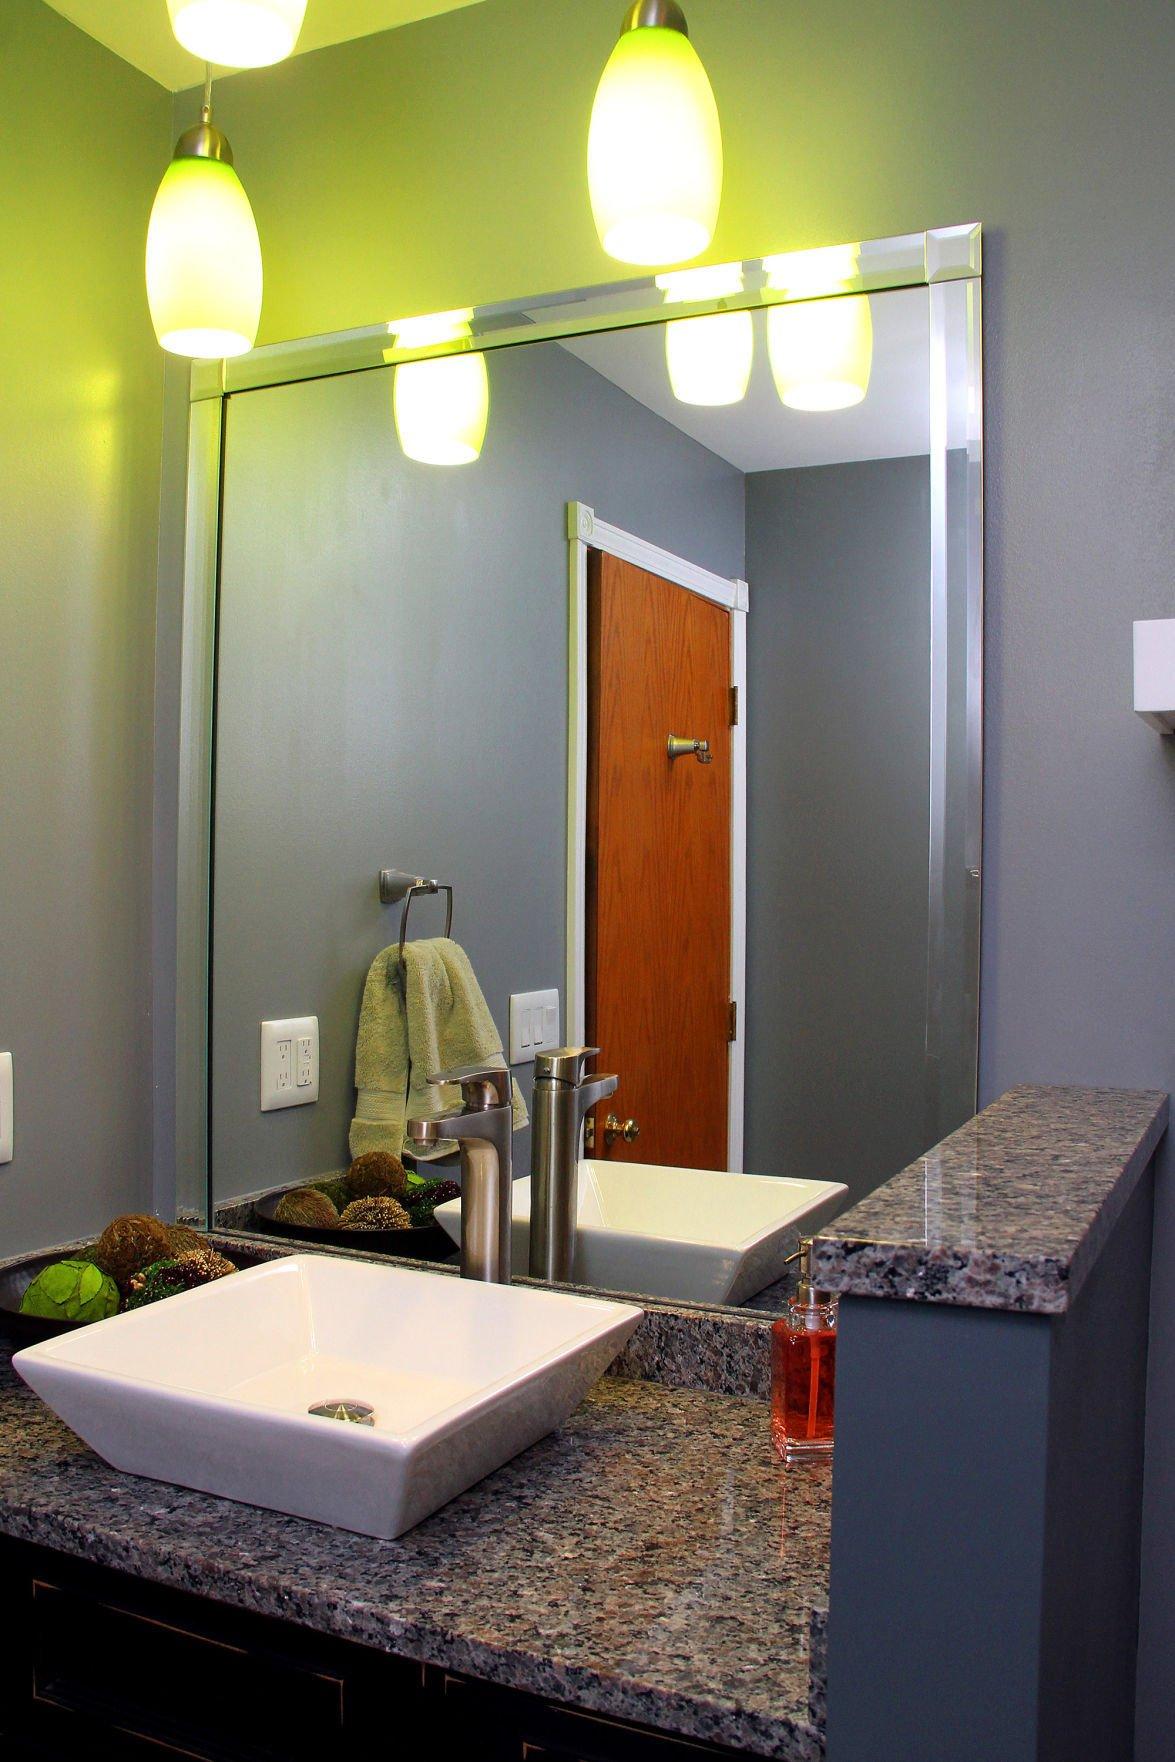 042015-lykam-bathroom-03